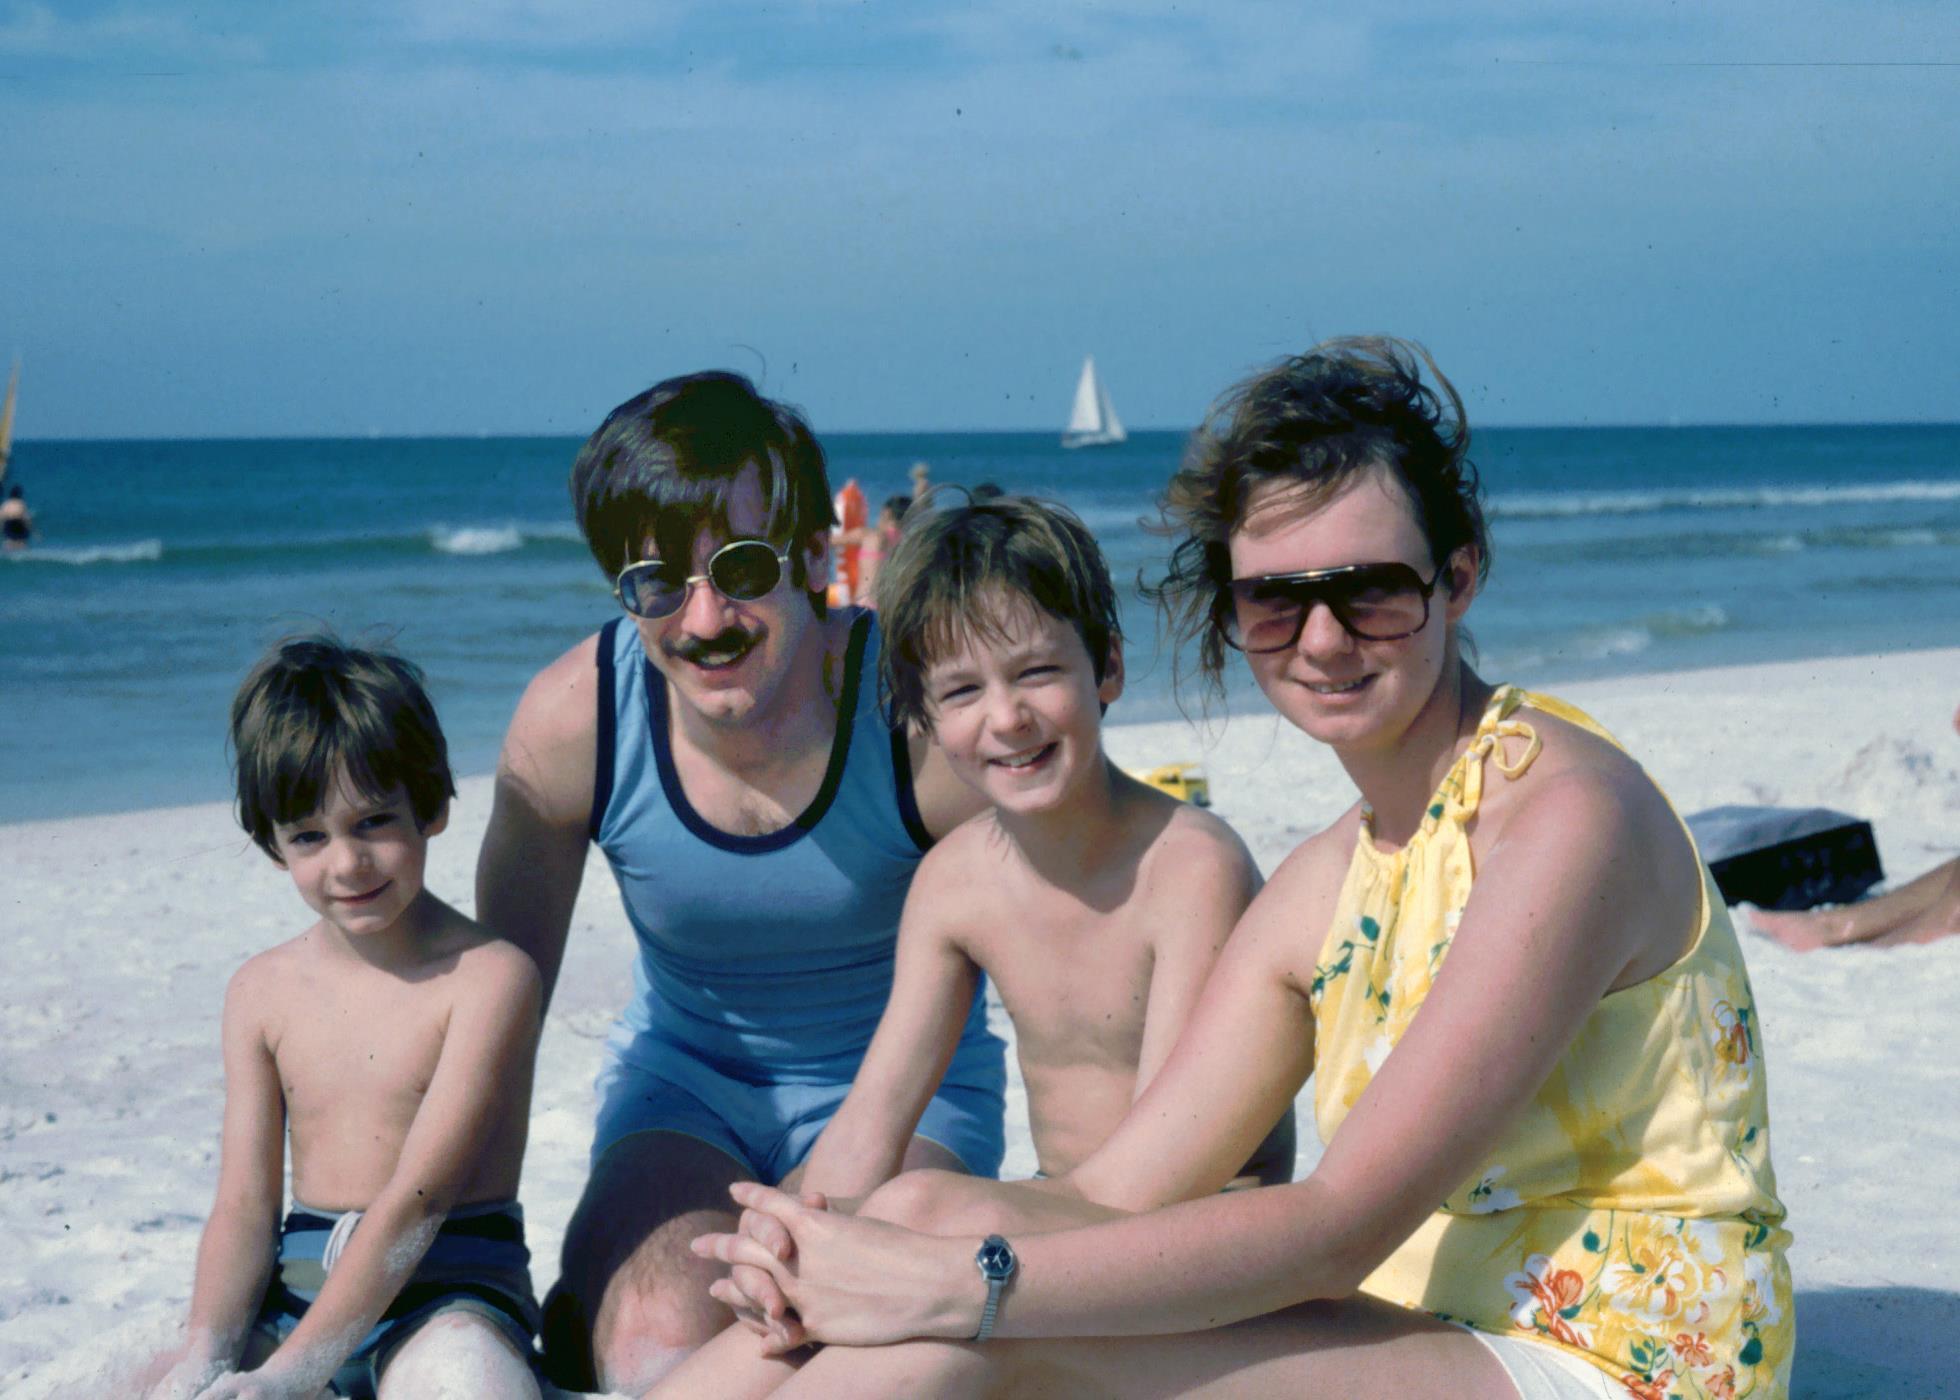 Throwback Thursday: Nearly 40 years ago